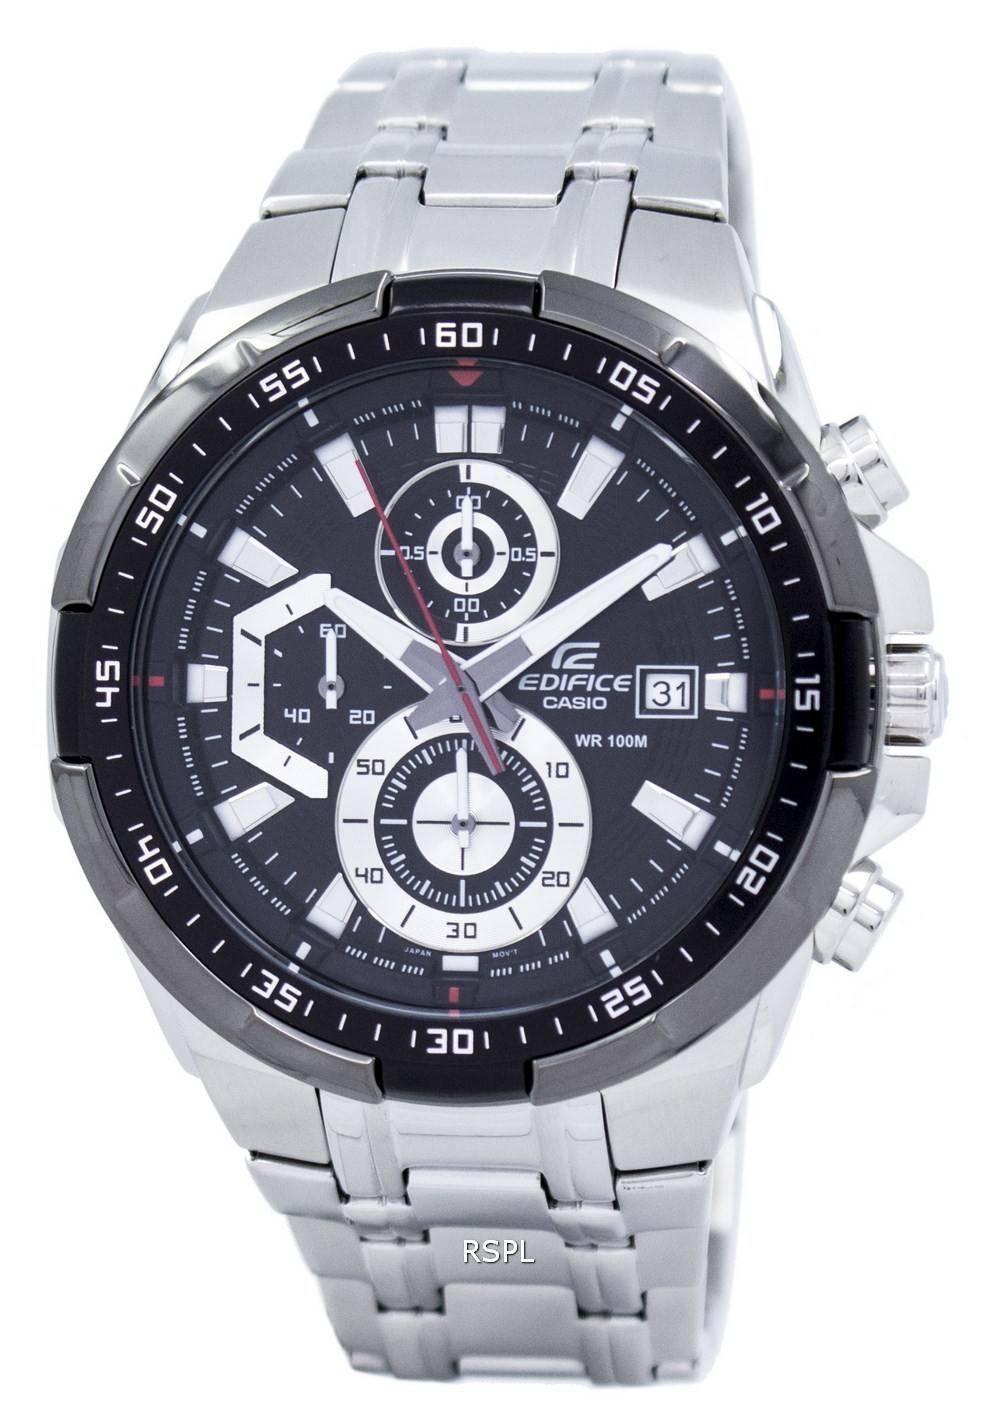 Casio Edifice Chronograph 100M EFR-539D-1AV Mens Watch - CityWatches.co.nz 664e8f7d4e